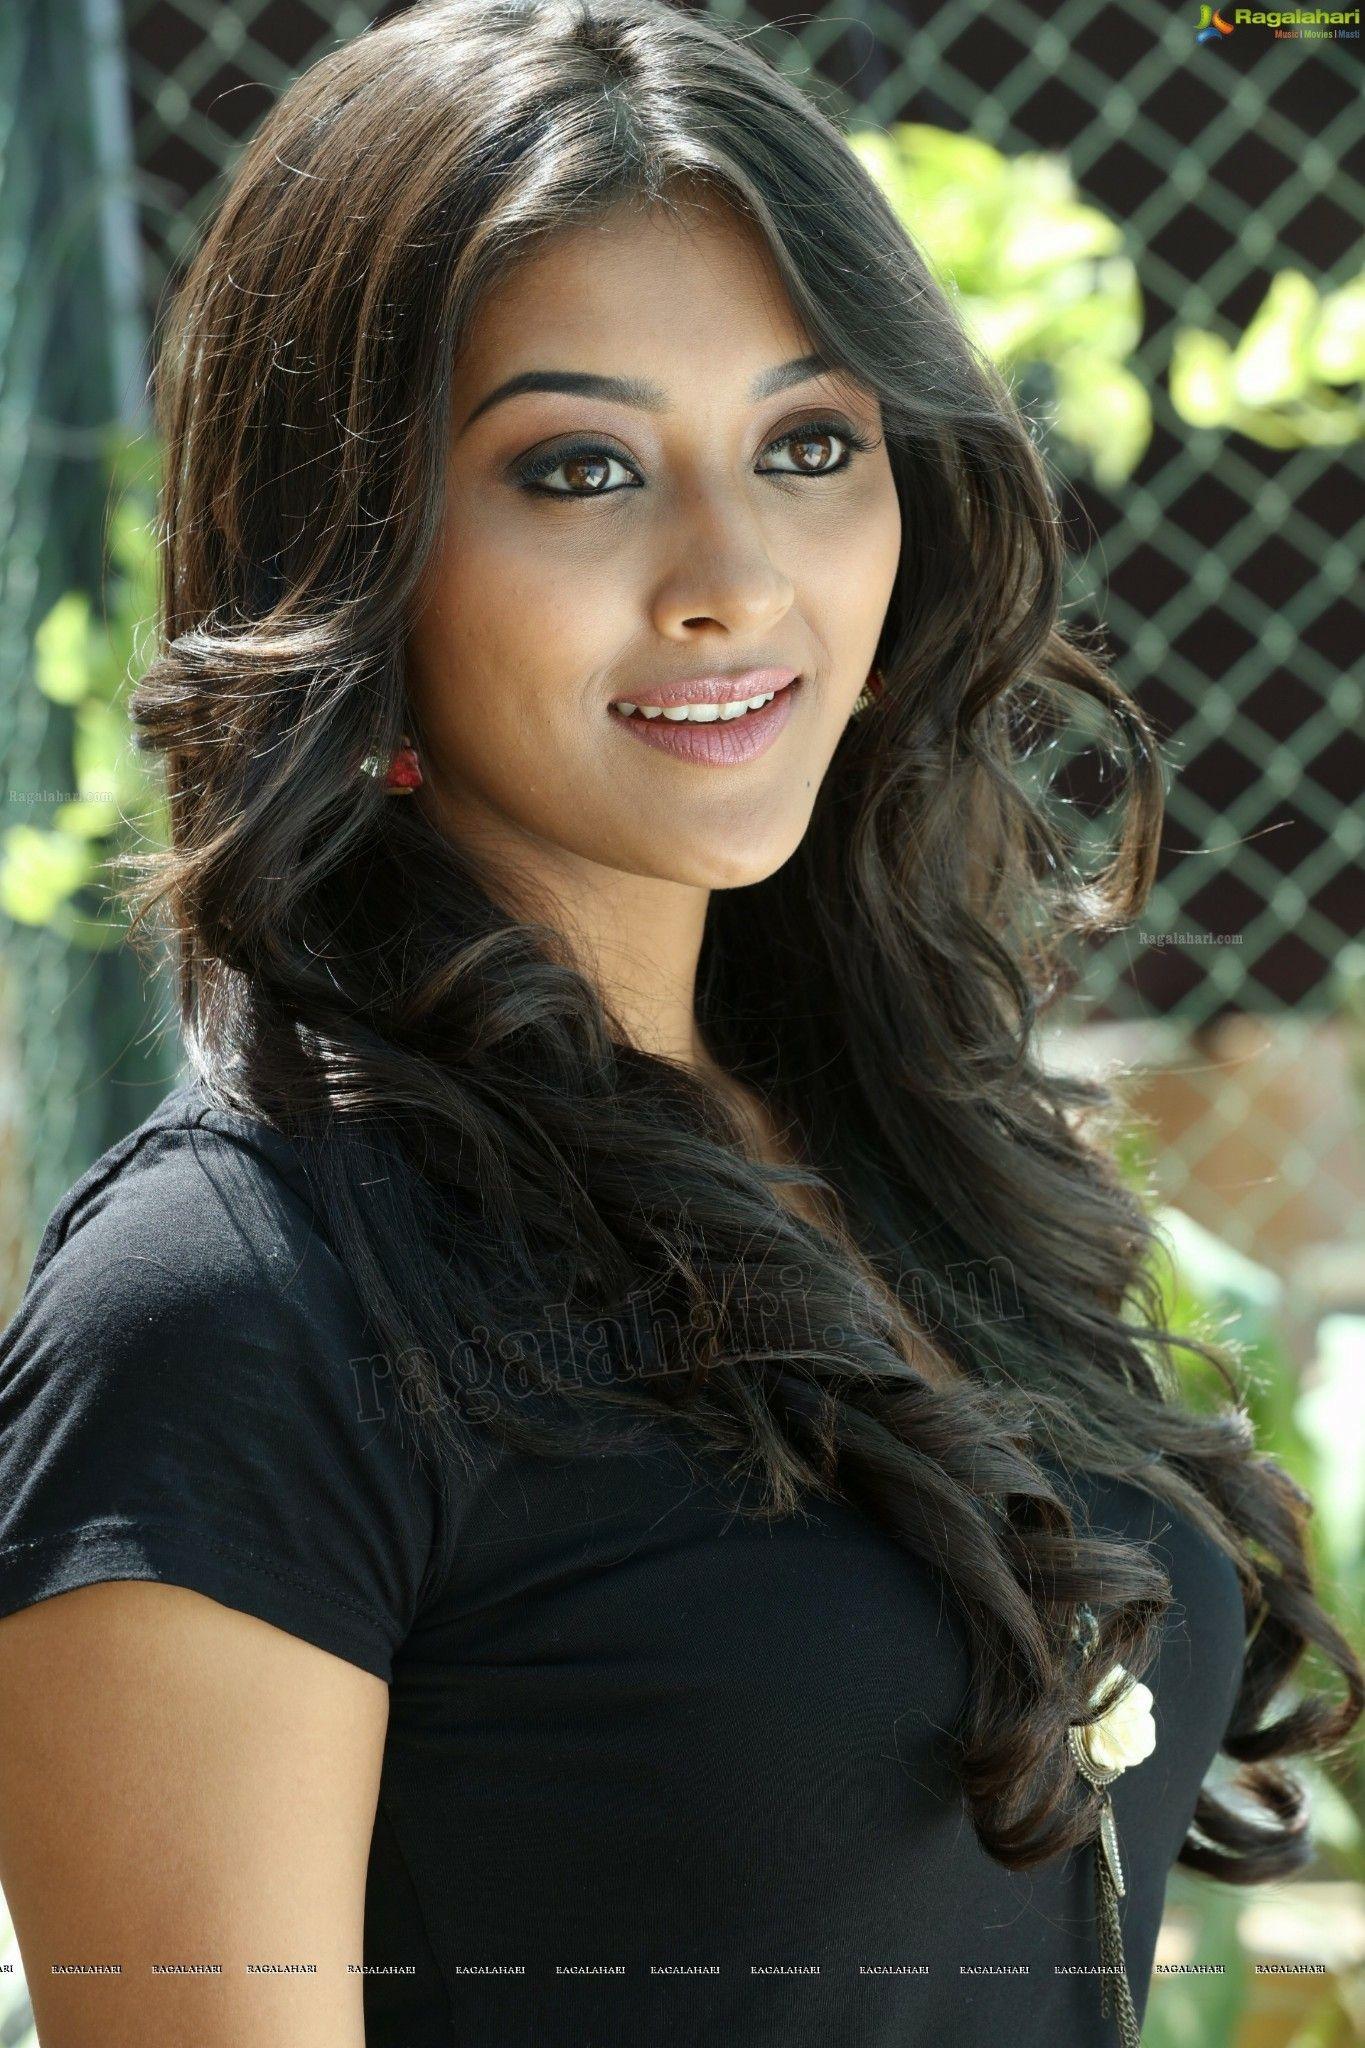 Most beautiful indian actress image by keshireddy pradeep